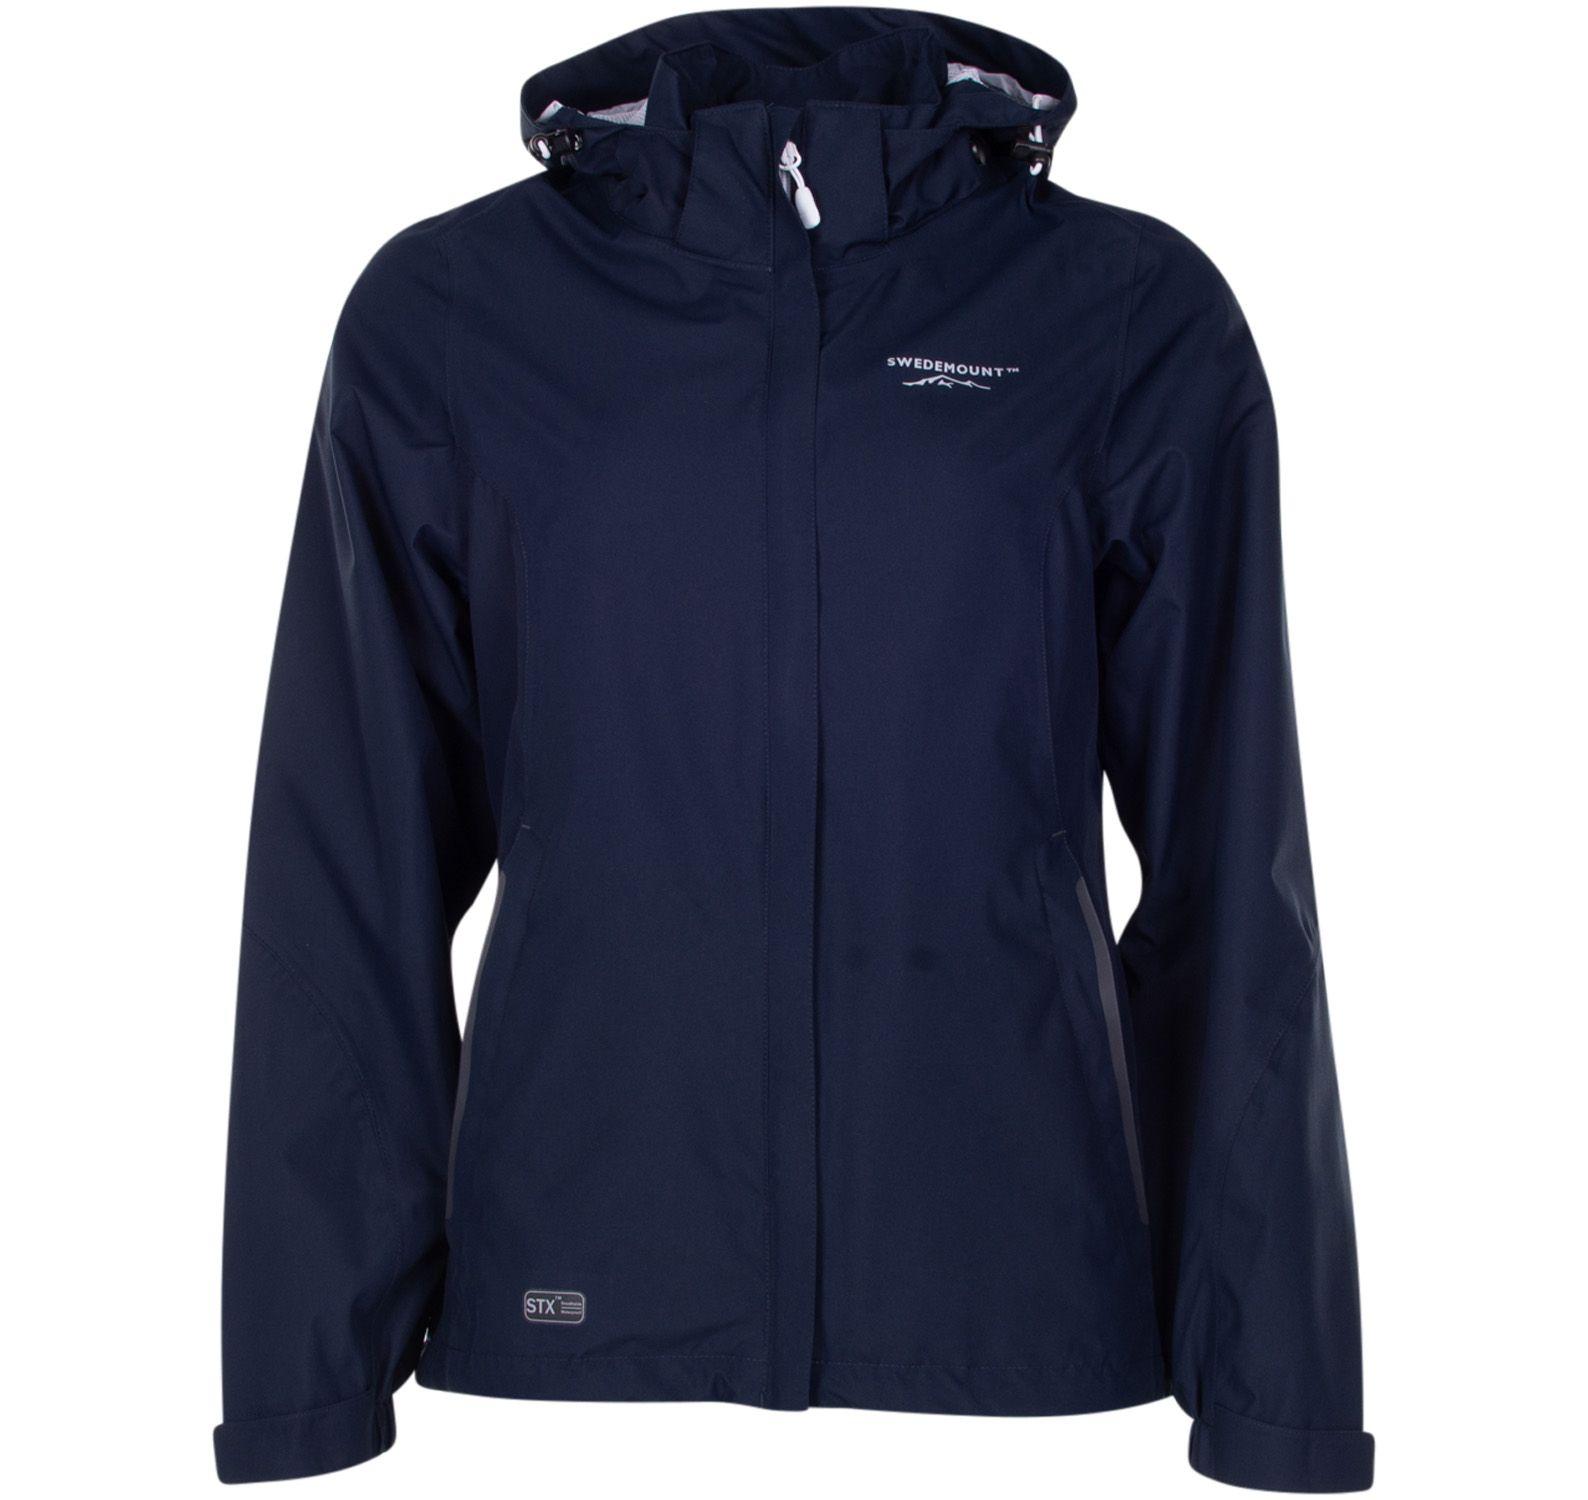 käringön jacket w, dk navy, 36, regnkläder